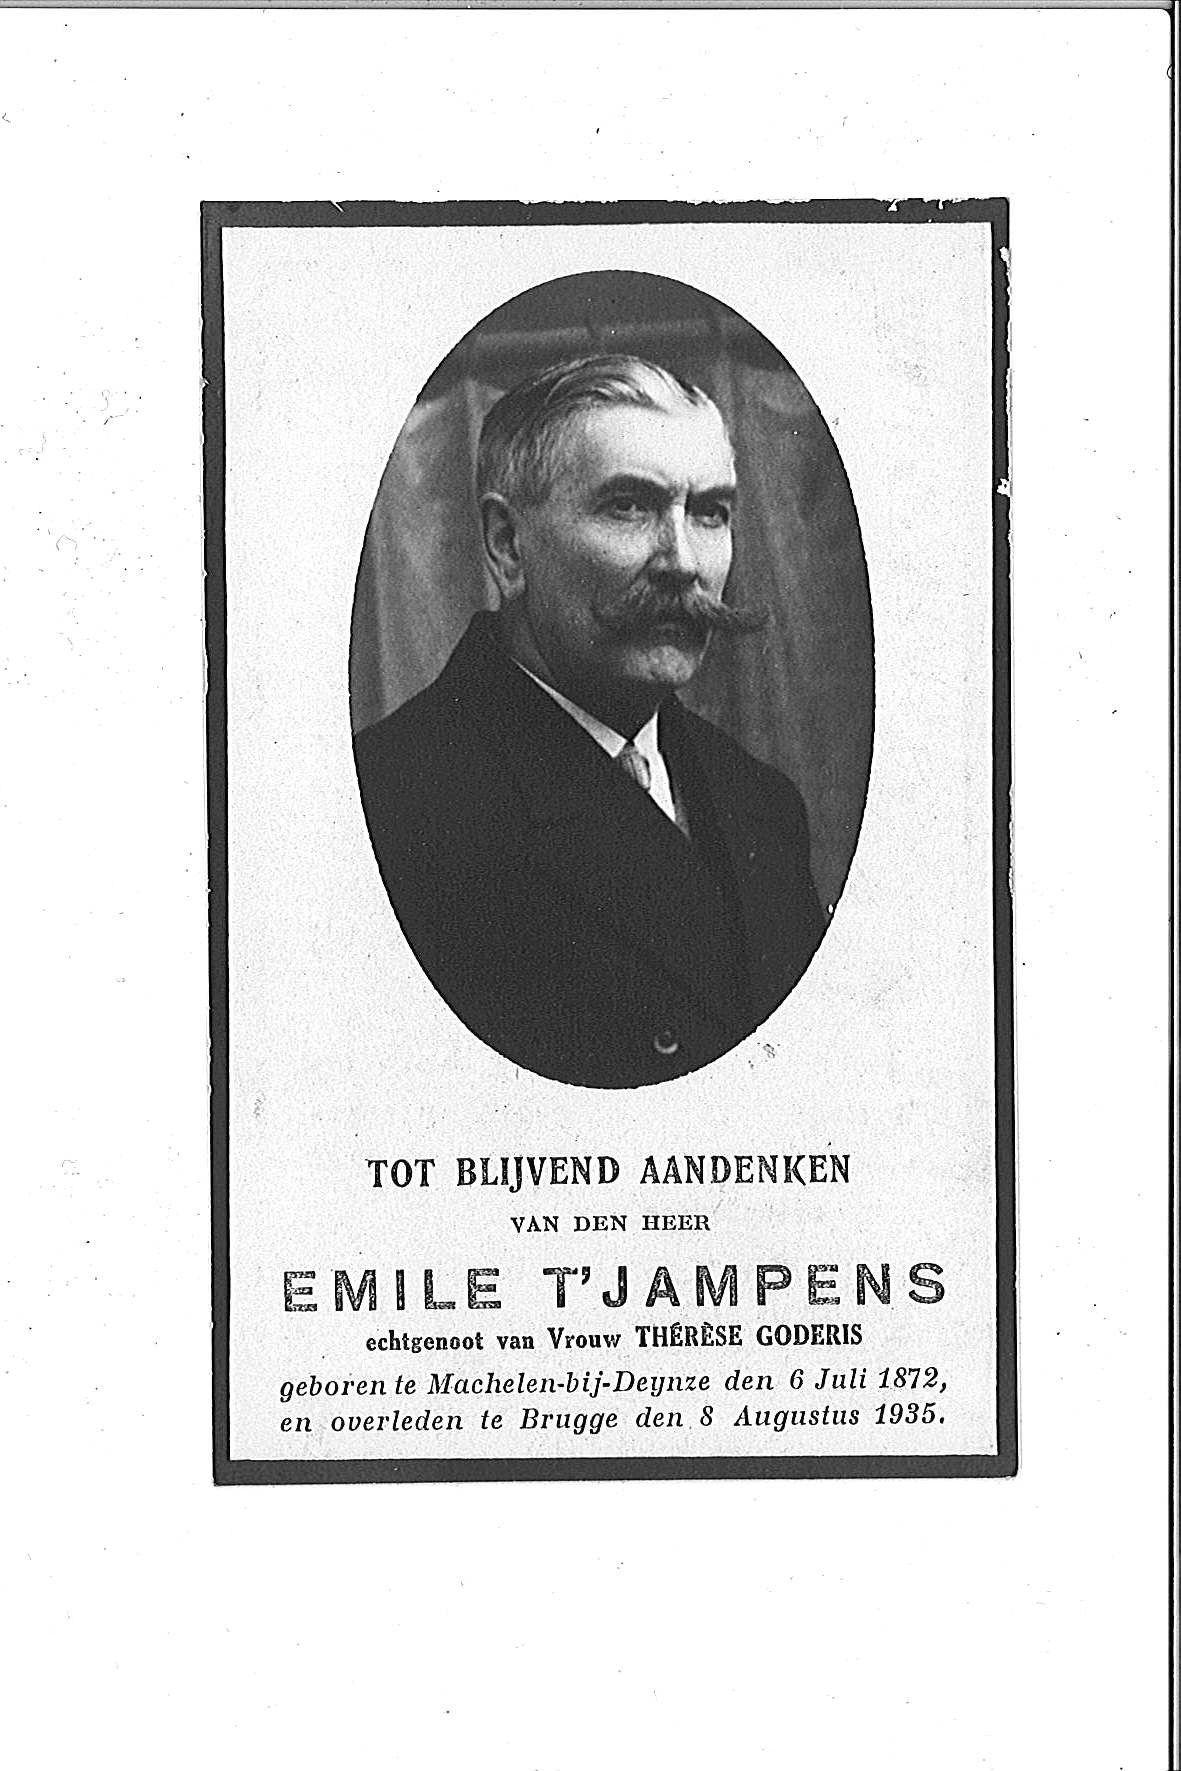 Emile(1935)20140912103237_00022.jpg